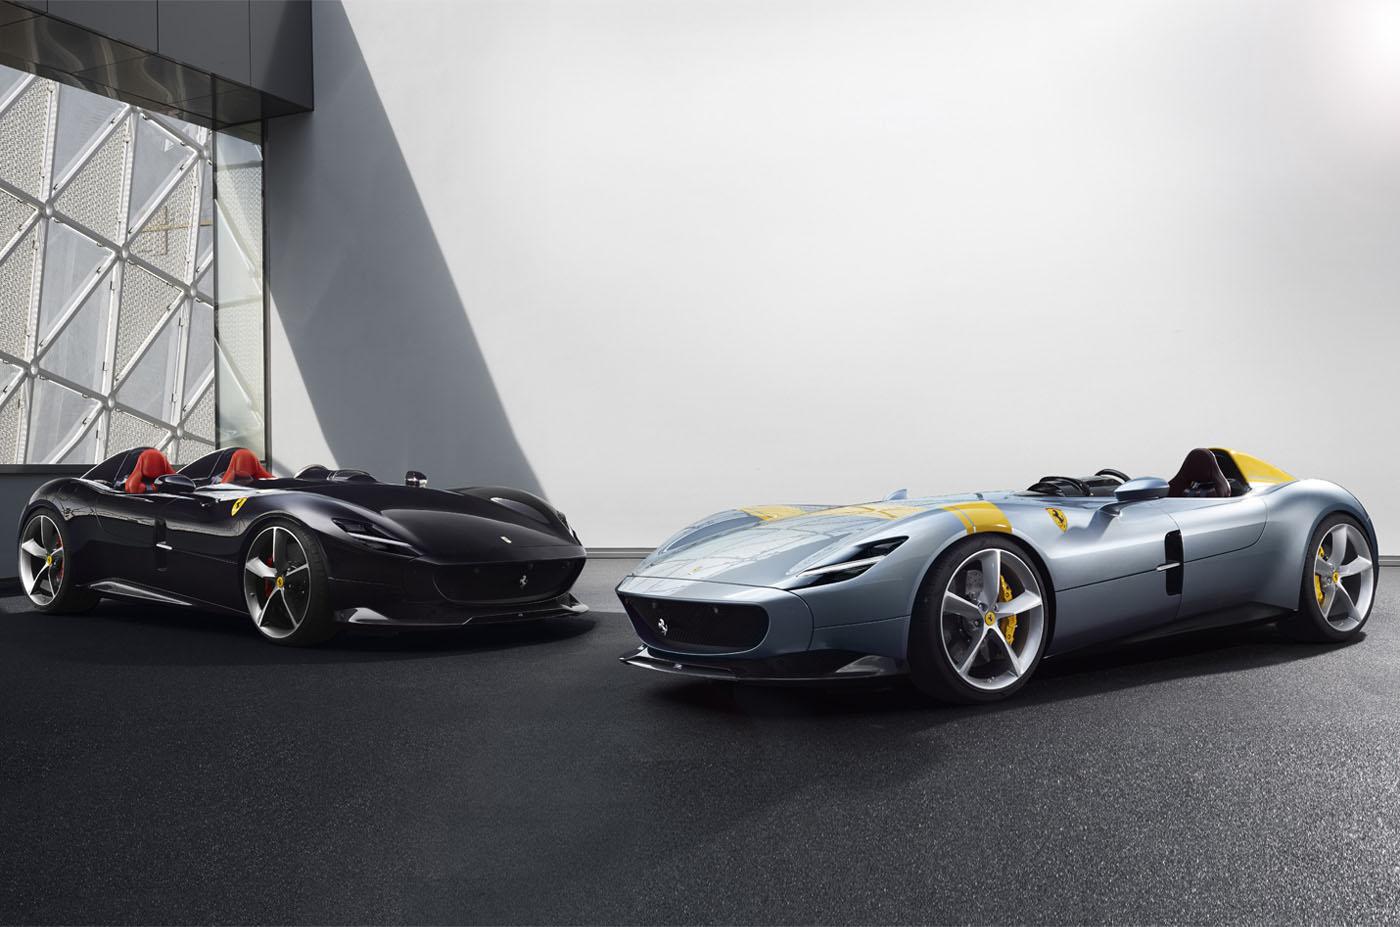 Premiera Ferrari Monza SP1 SP2, blog o motoryzacji